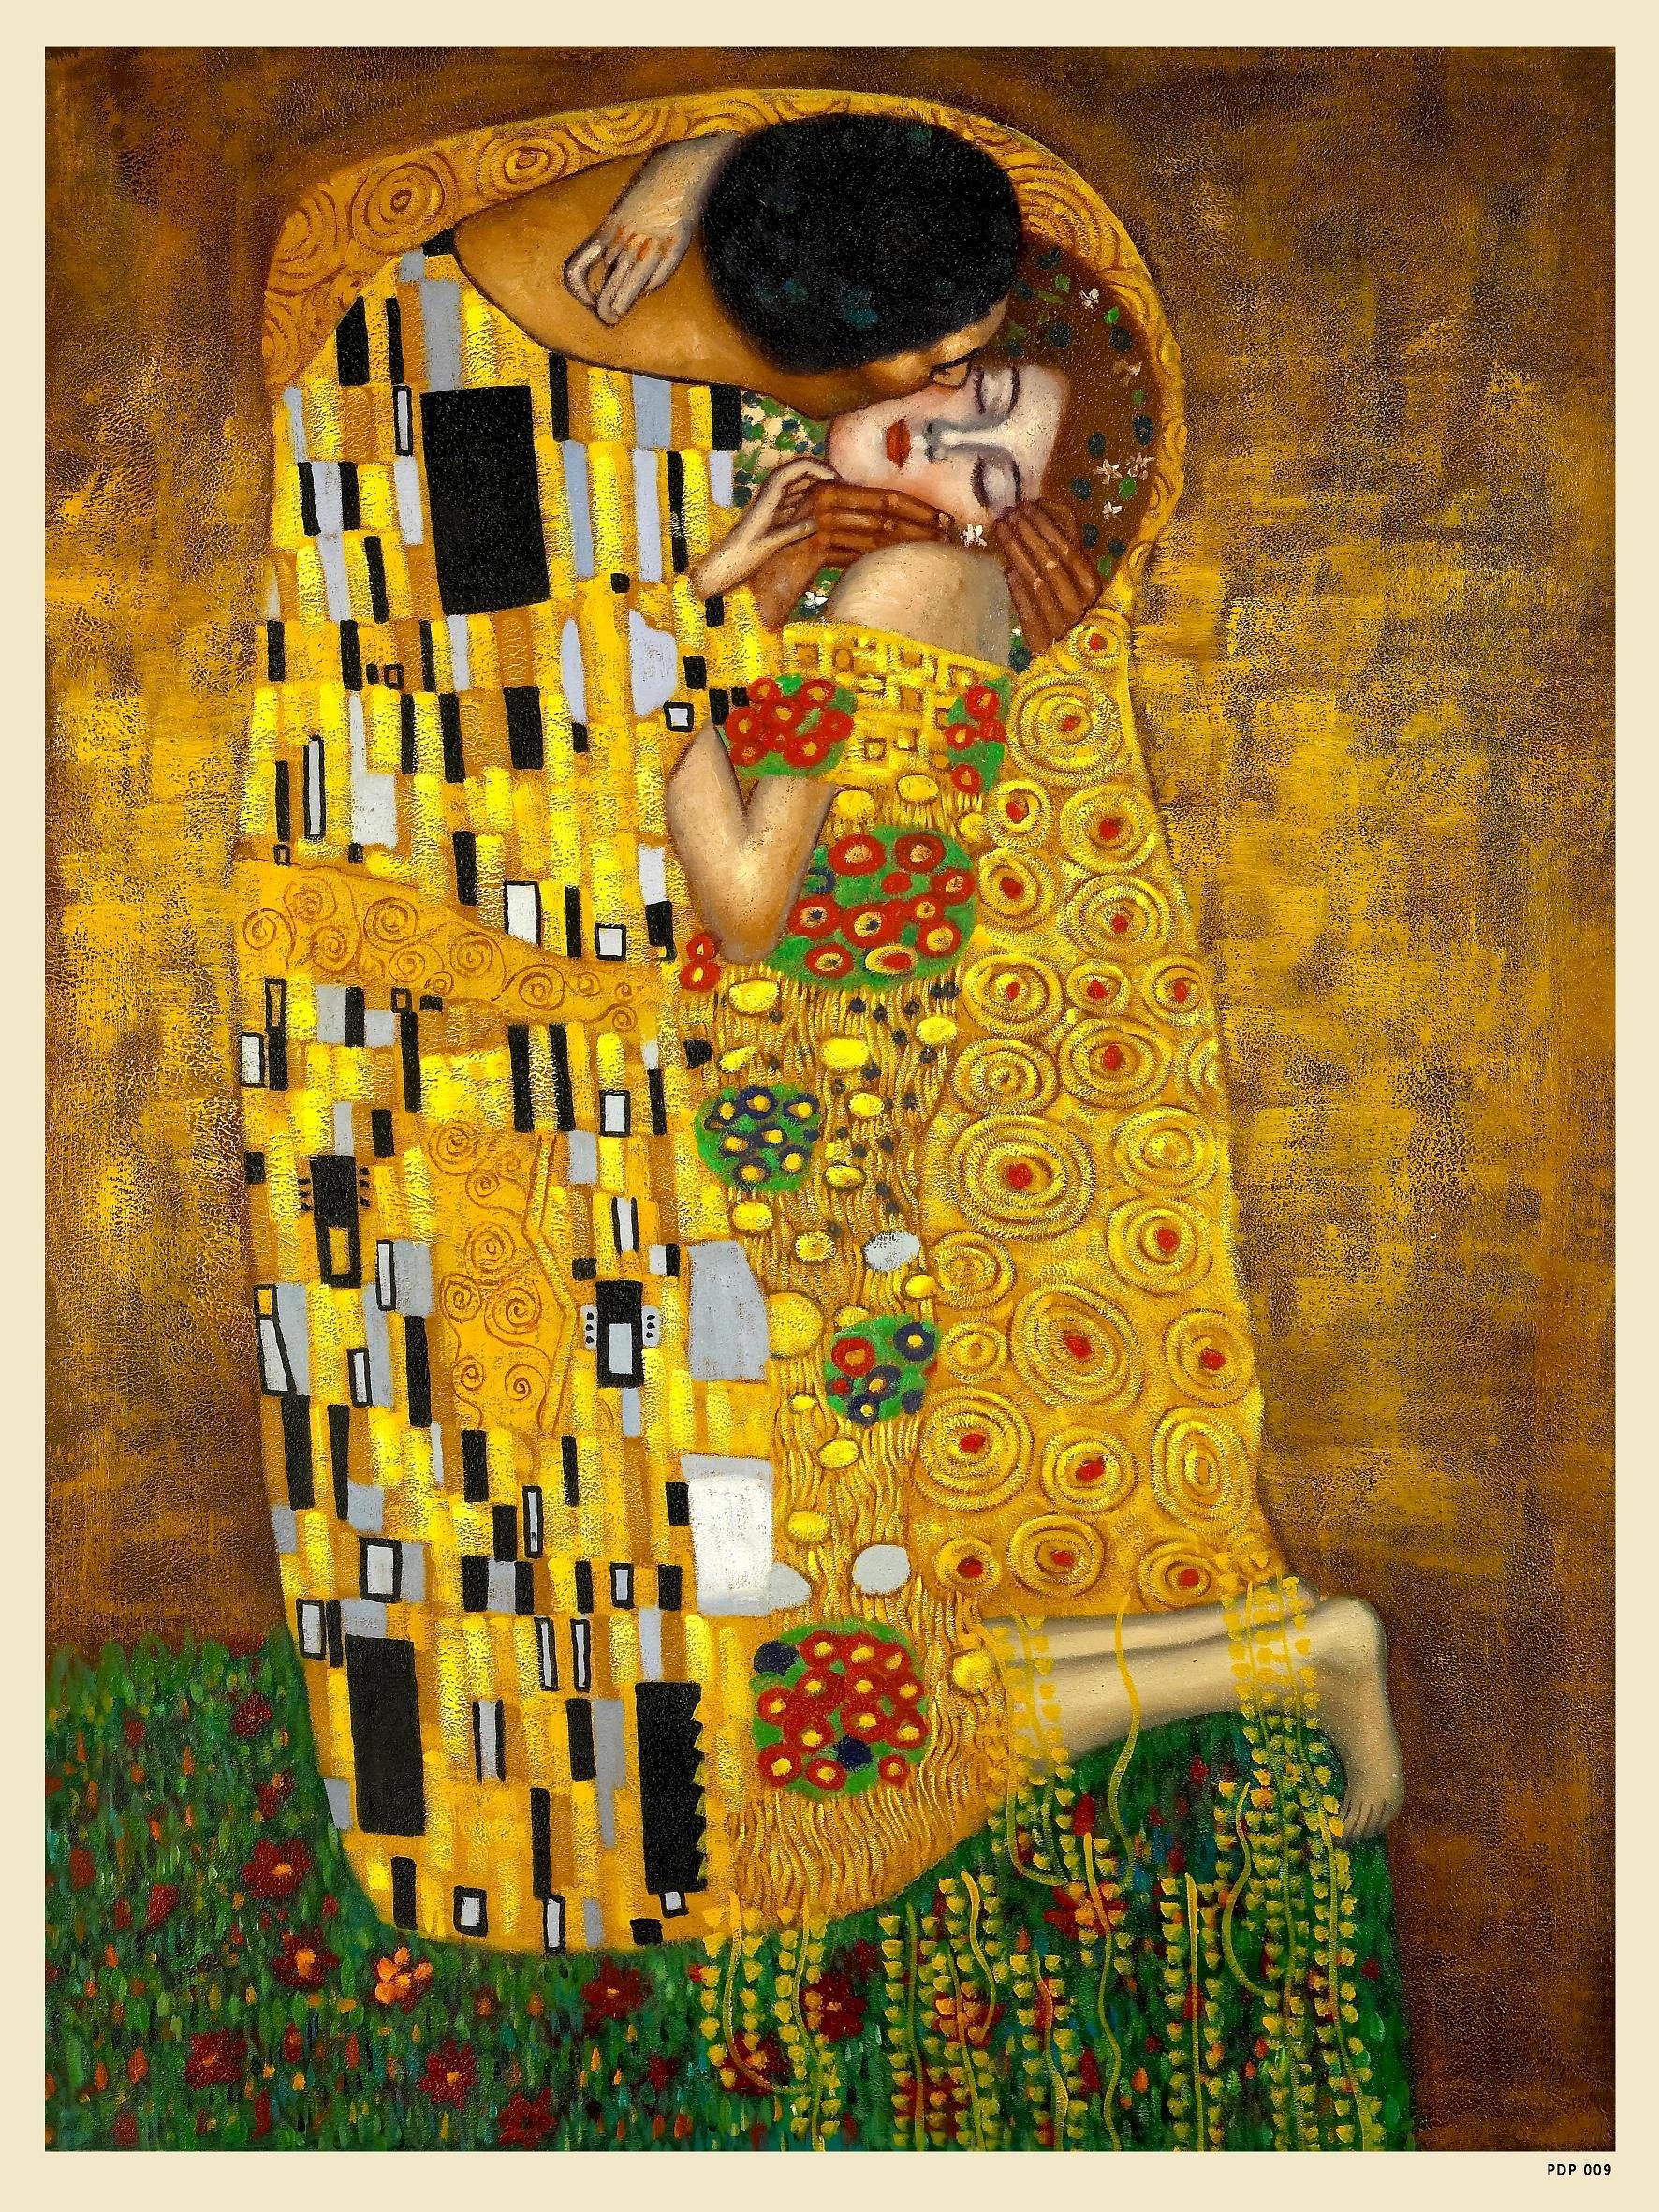 Gustav Klimt - The Kiss - Painting